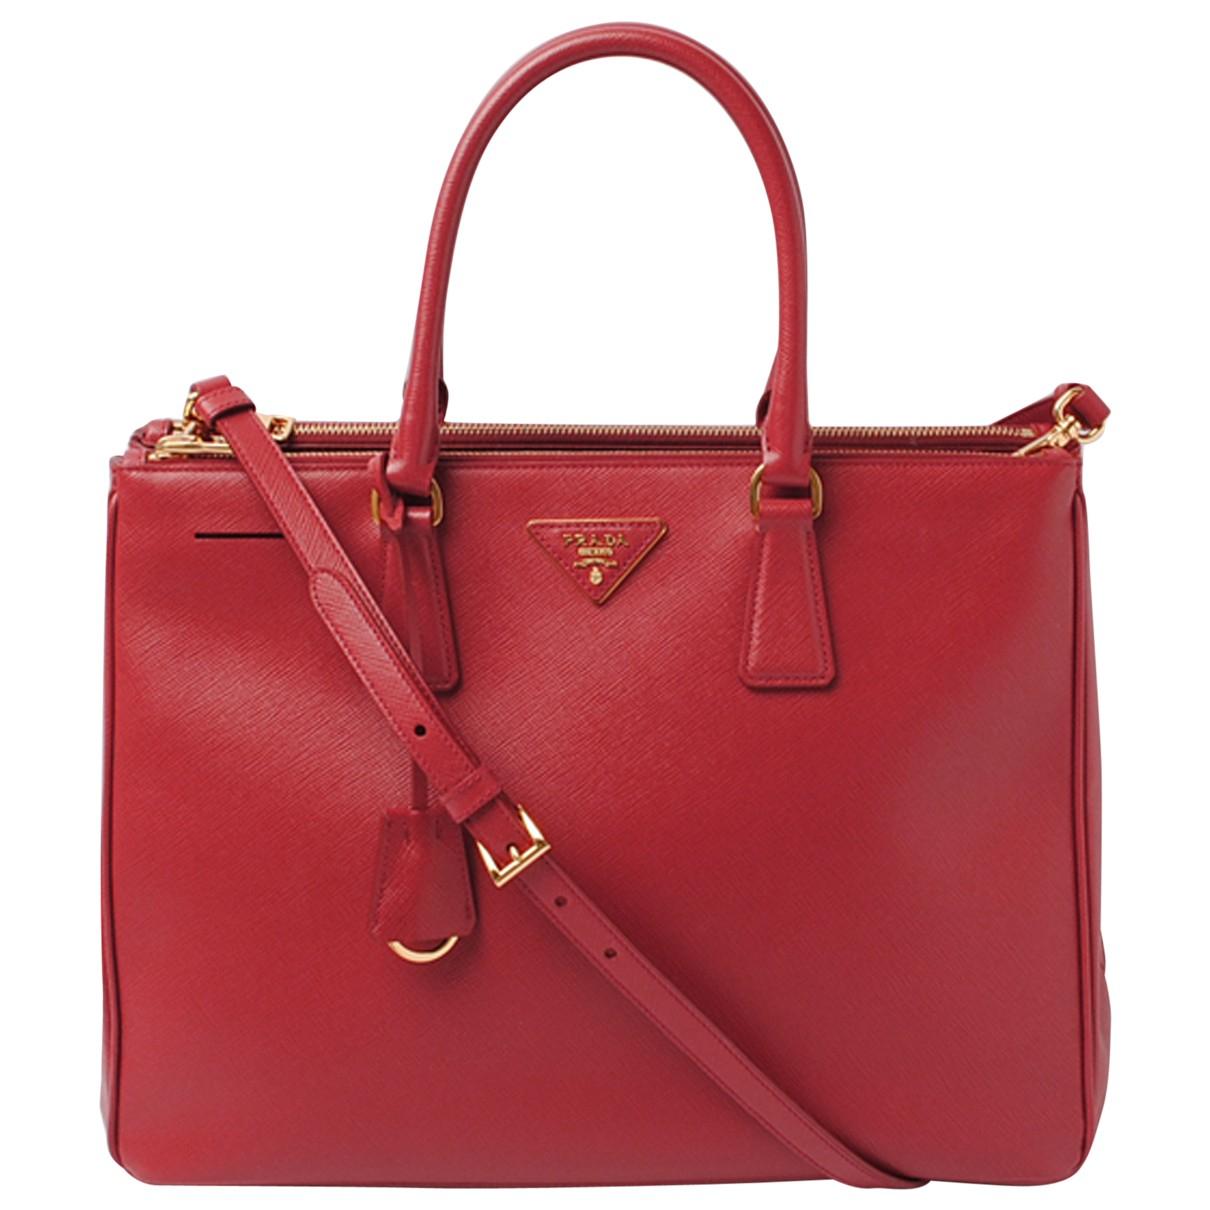 Prada Galleria Handtasche in  Rot Leder